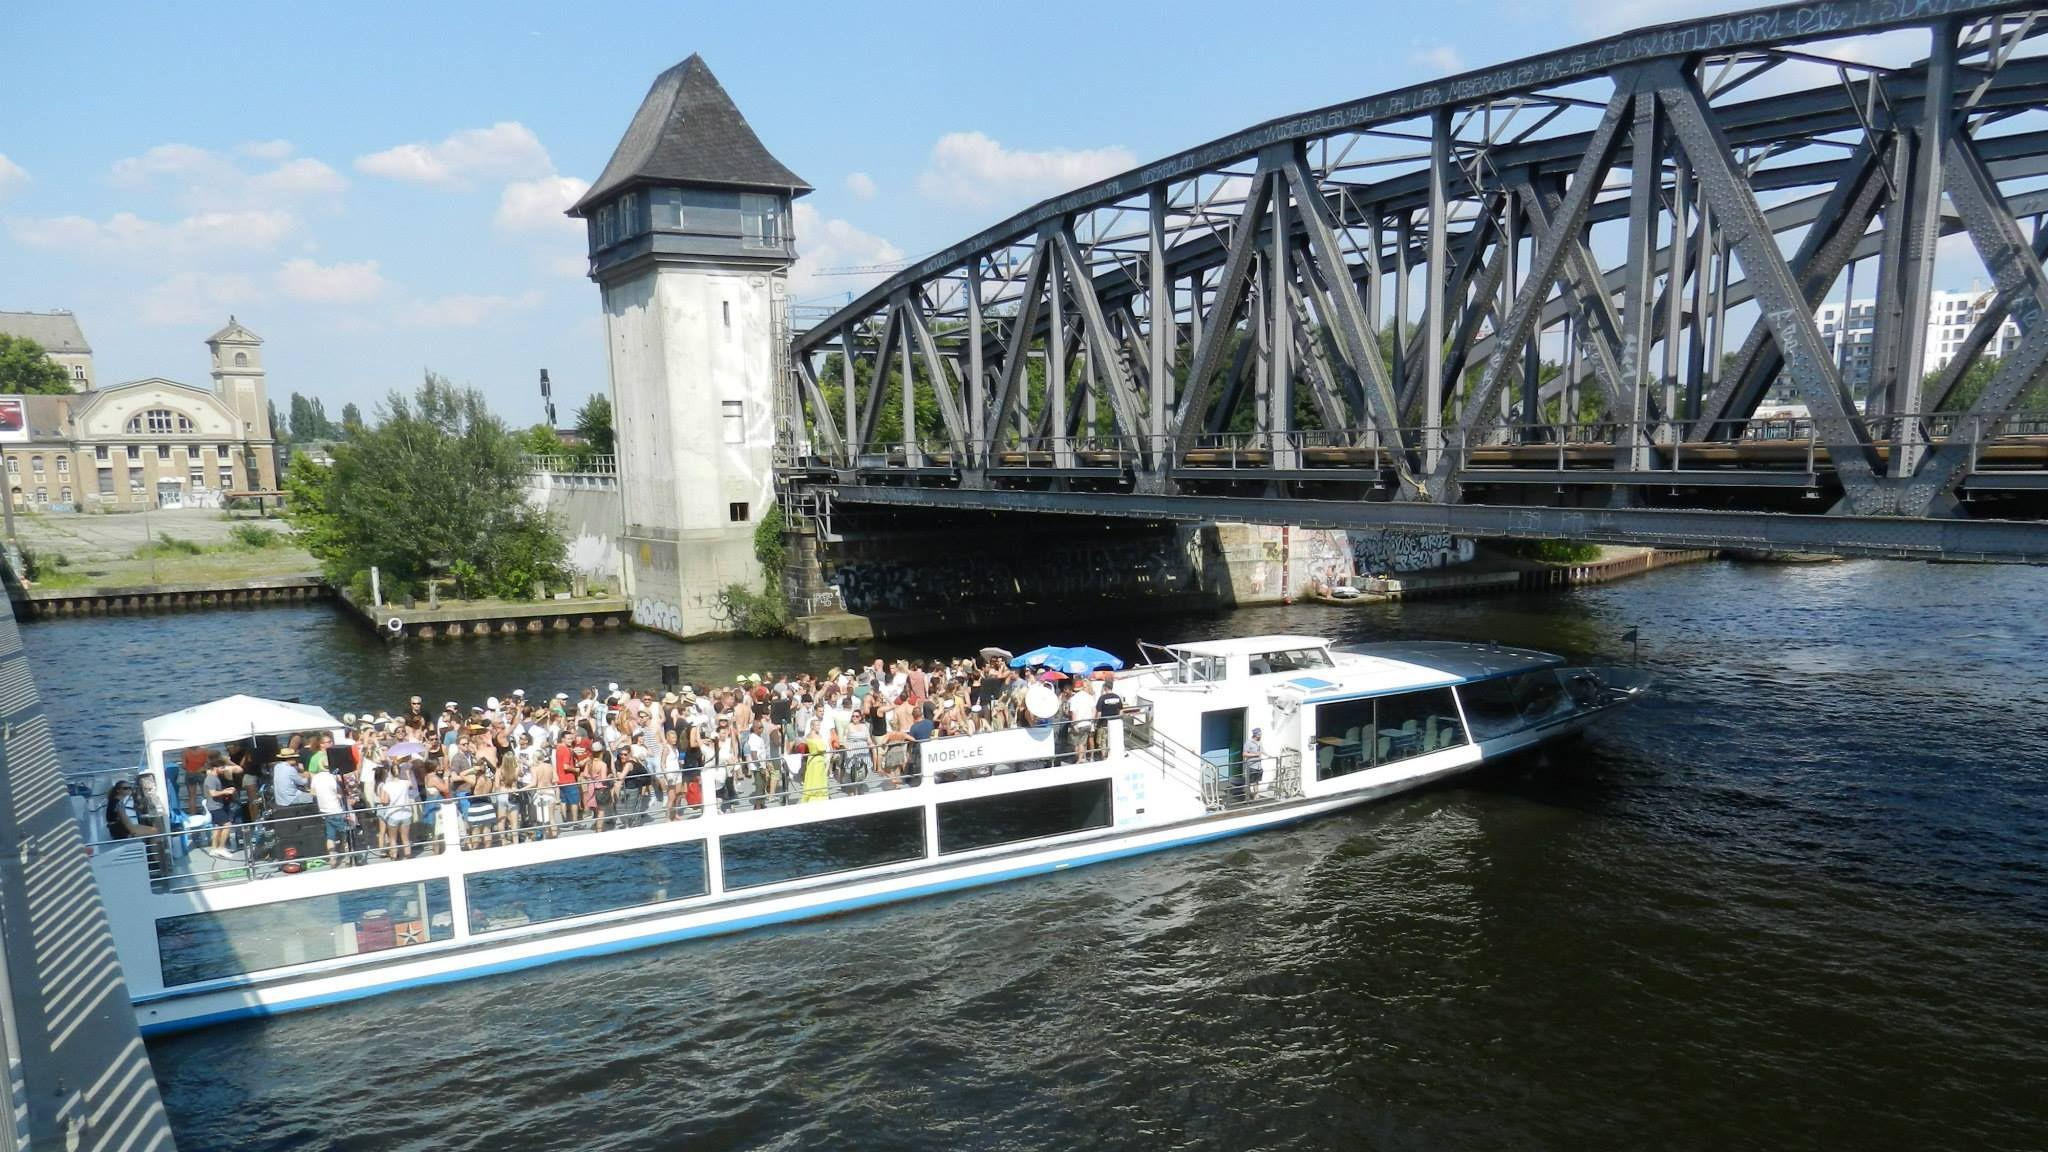 Boat sailing under a bridge on the Spree river